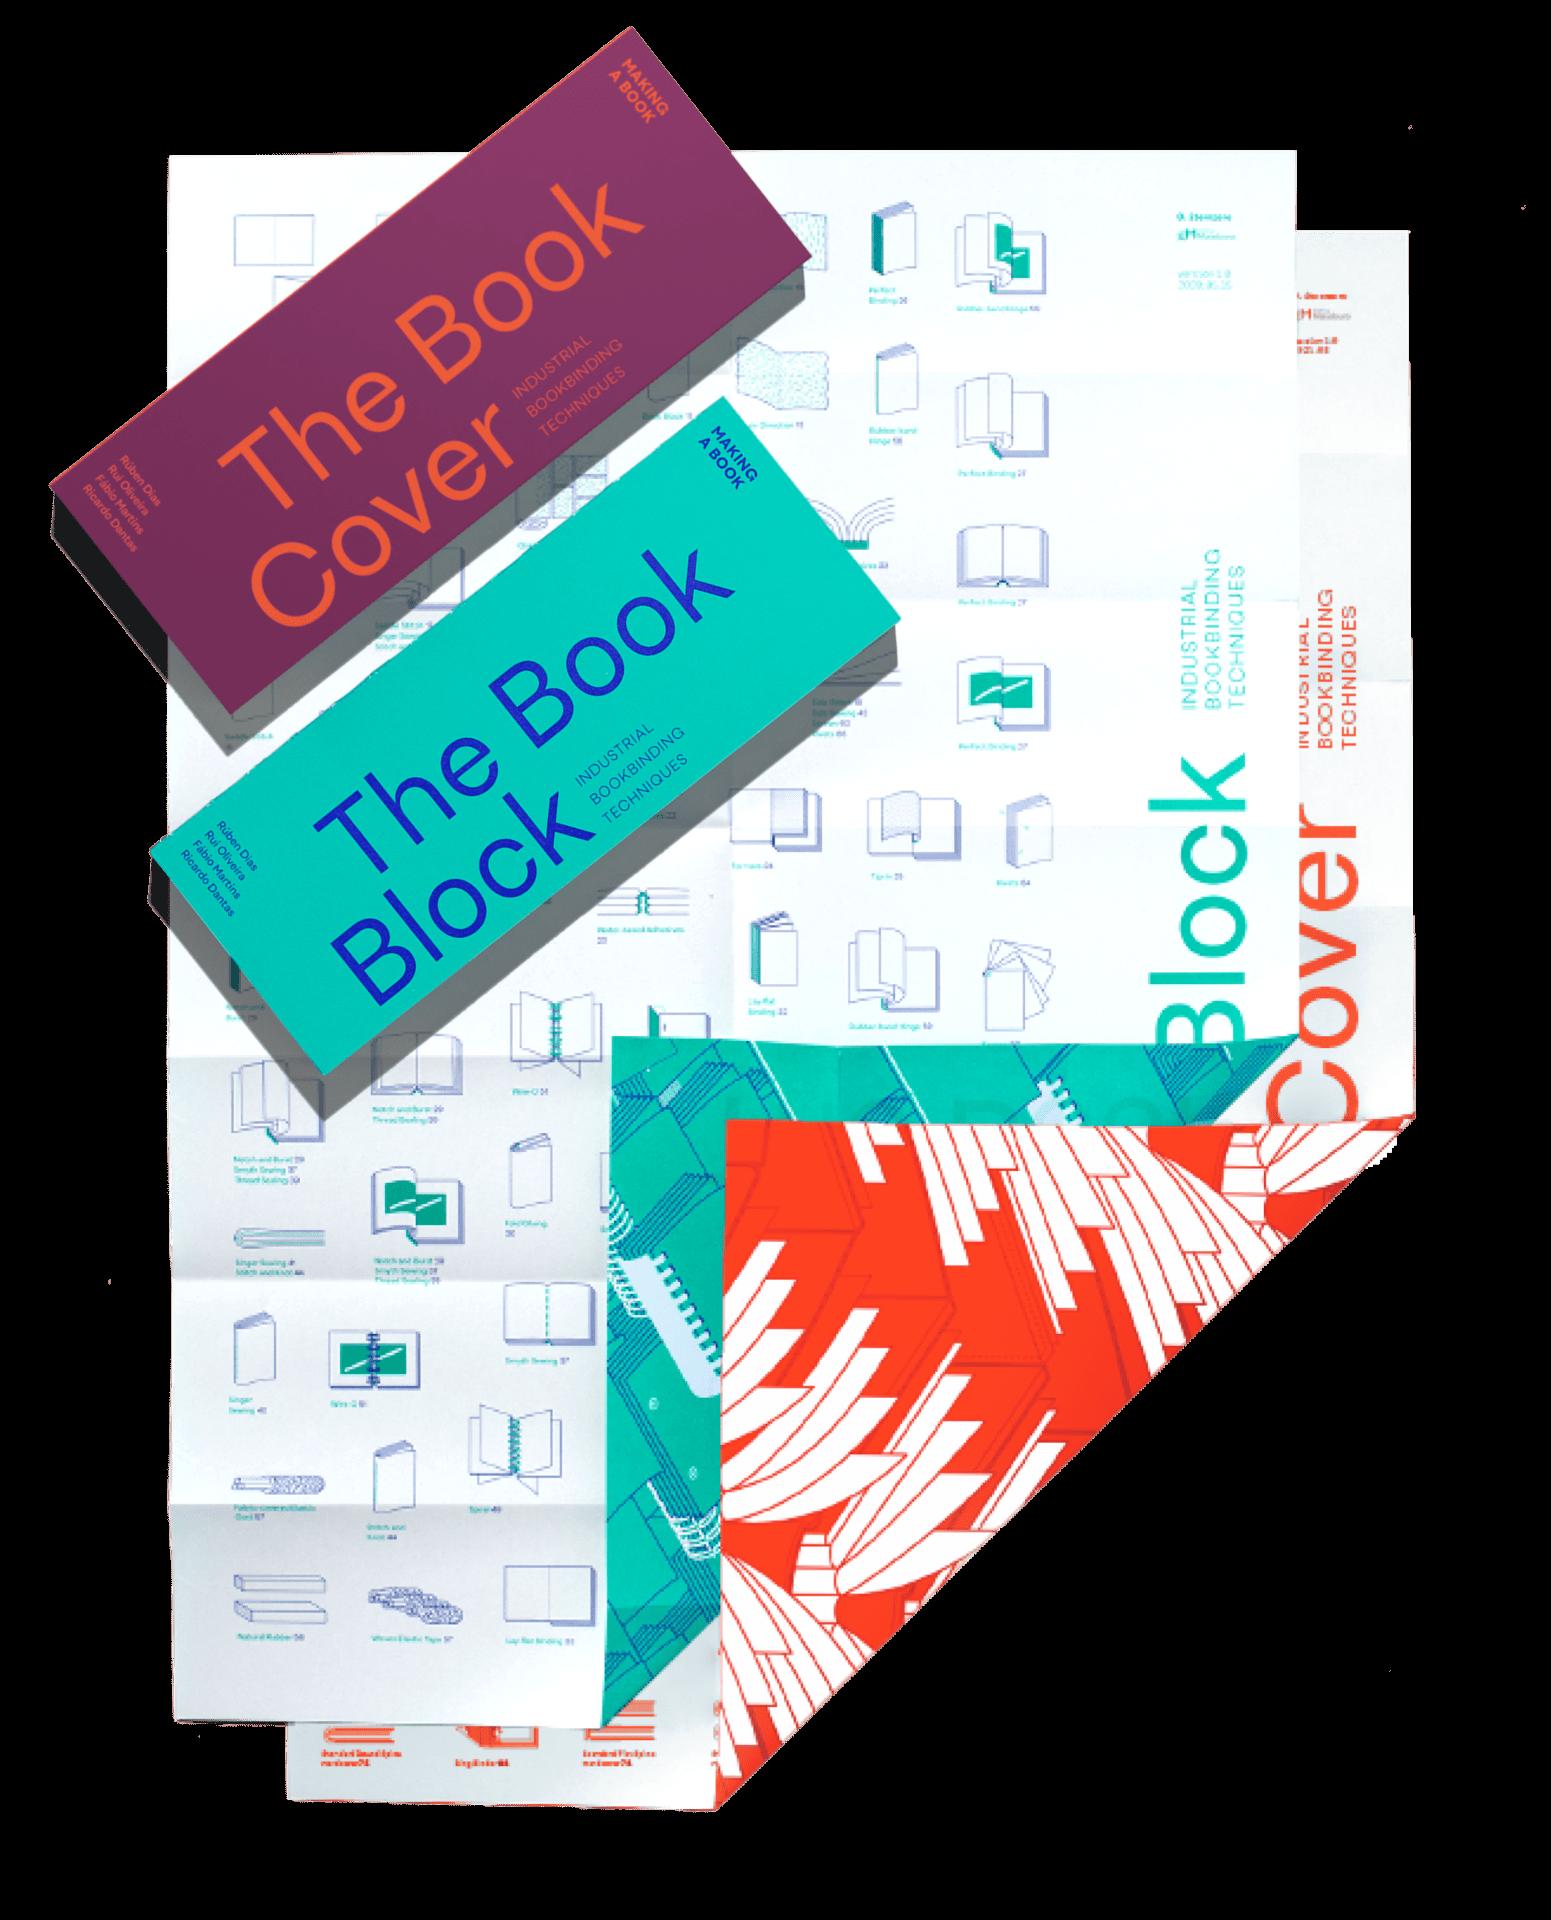 book cover + book block + poster book cover + poster book block